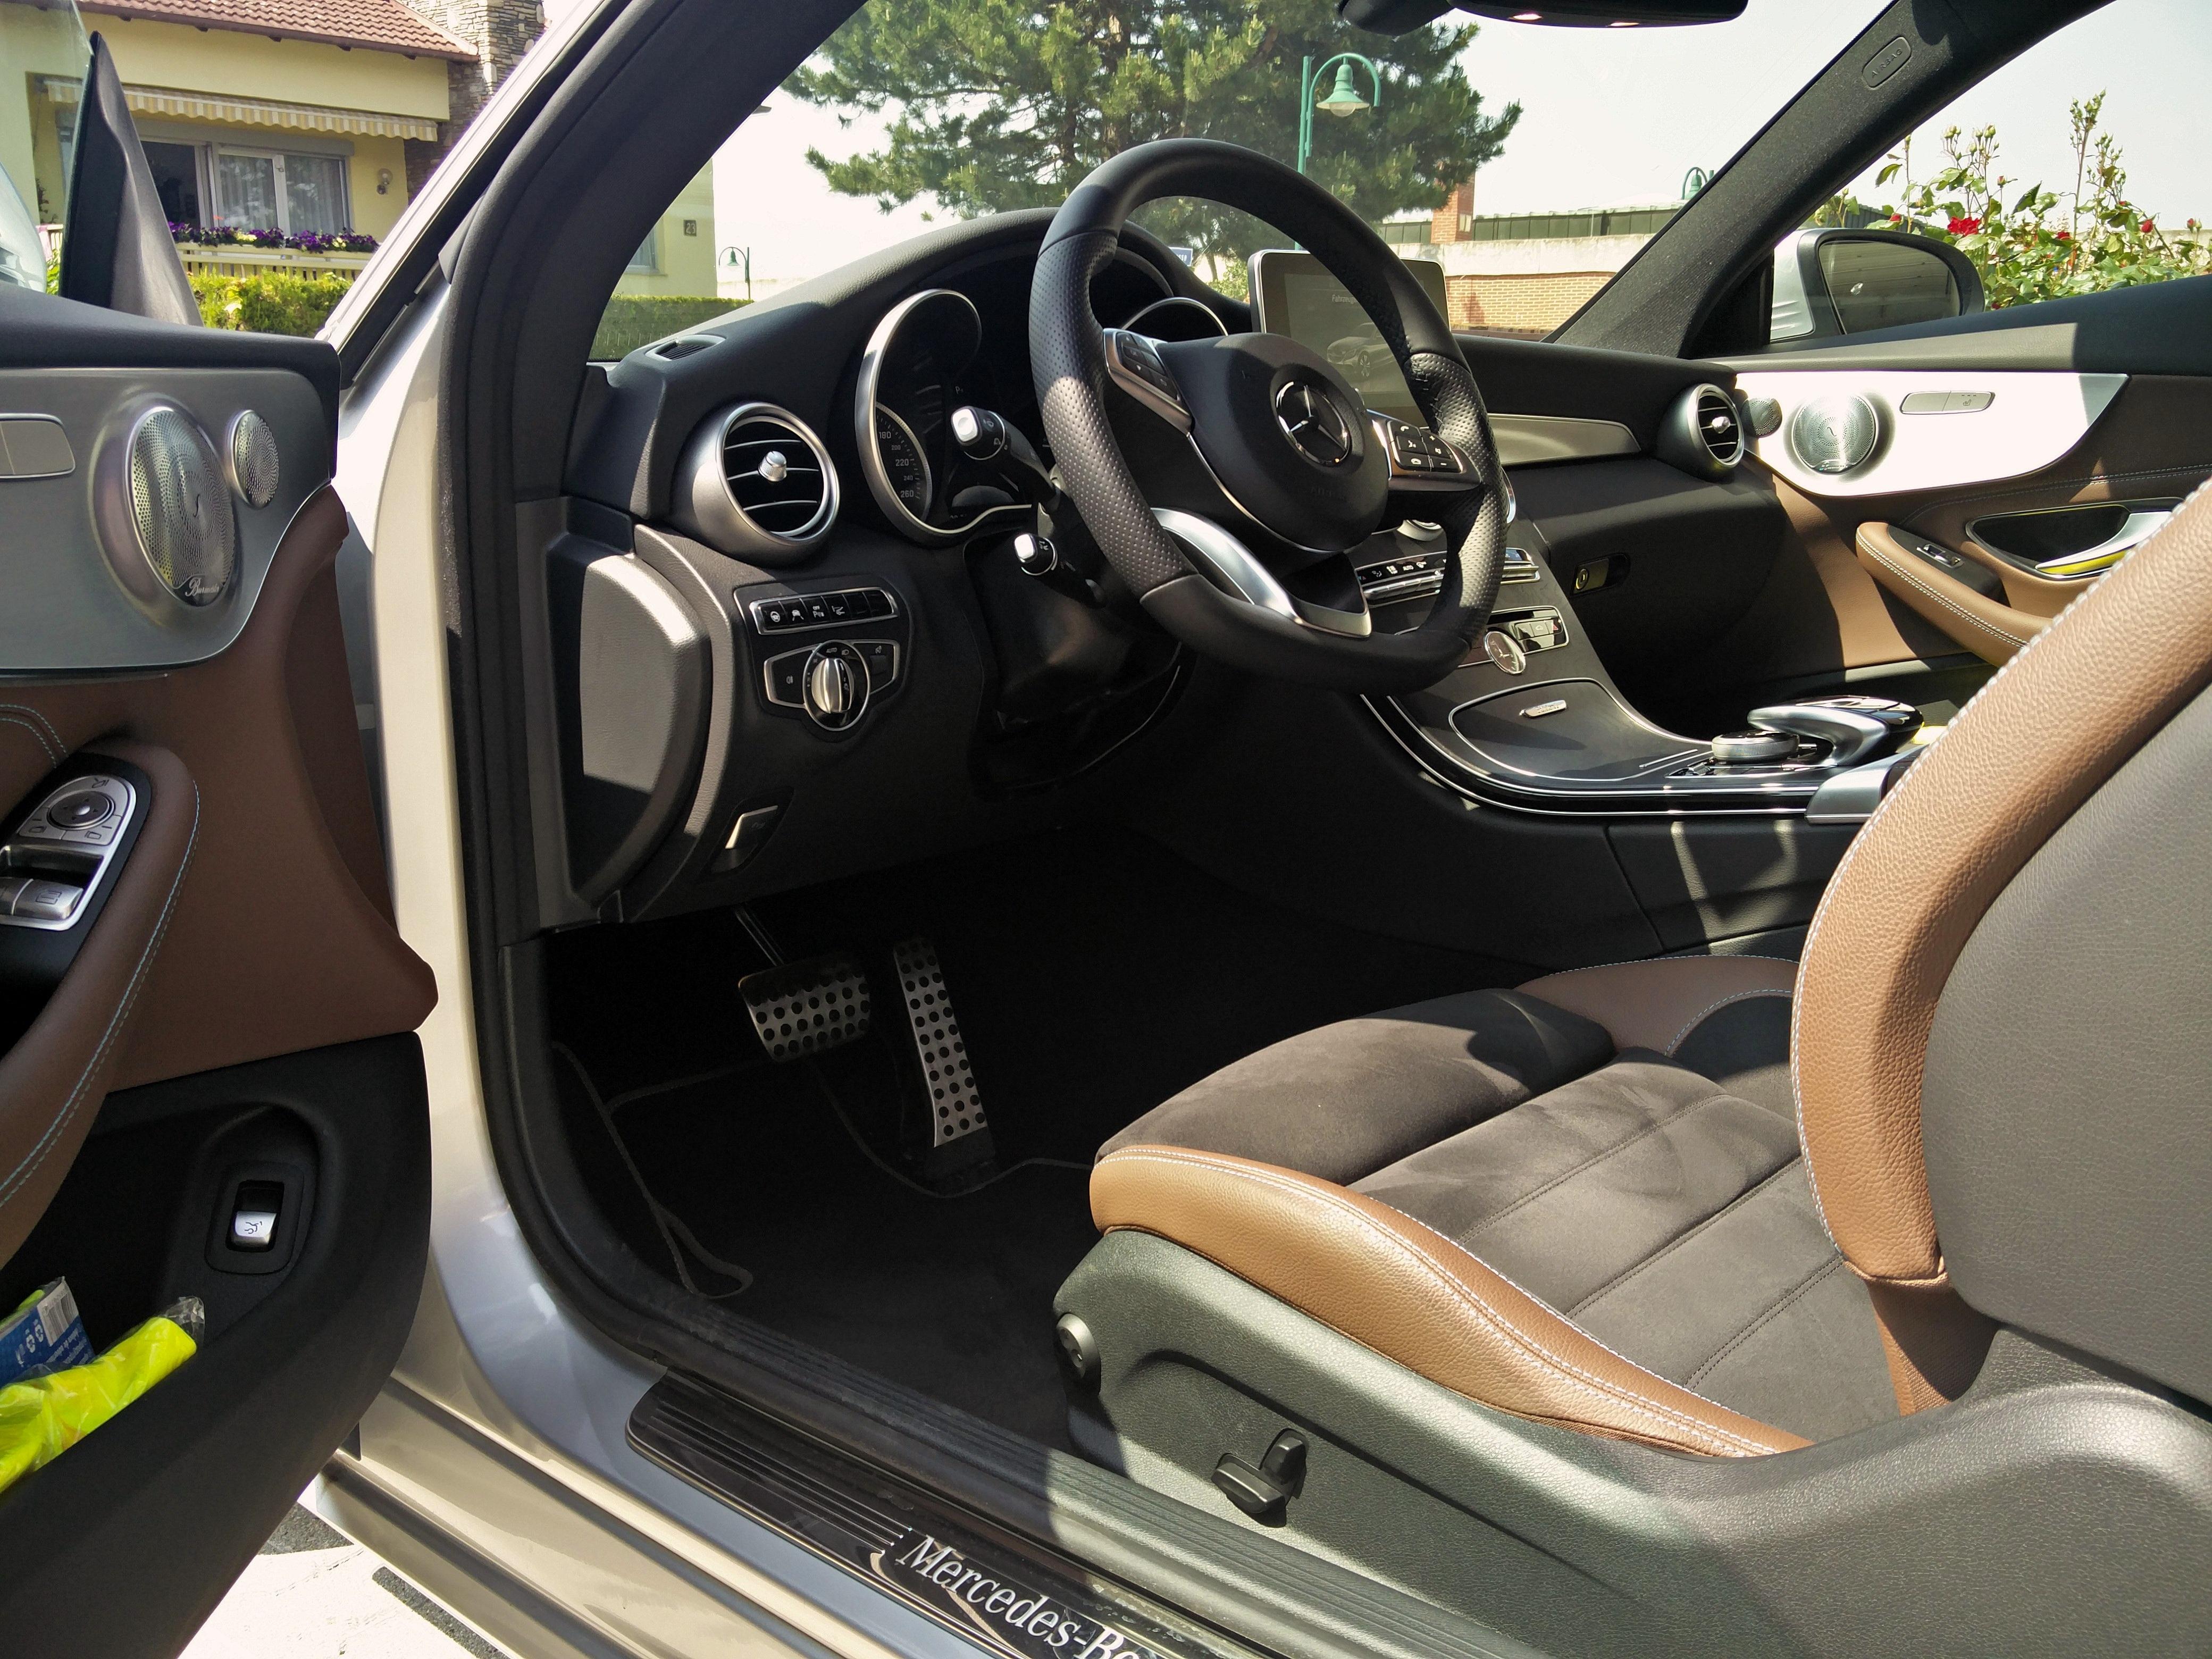 Kostenlose foto : Auto, Sessel, Innere, Fahrzeug, Lenkrad ...